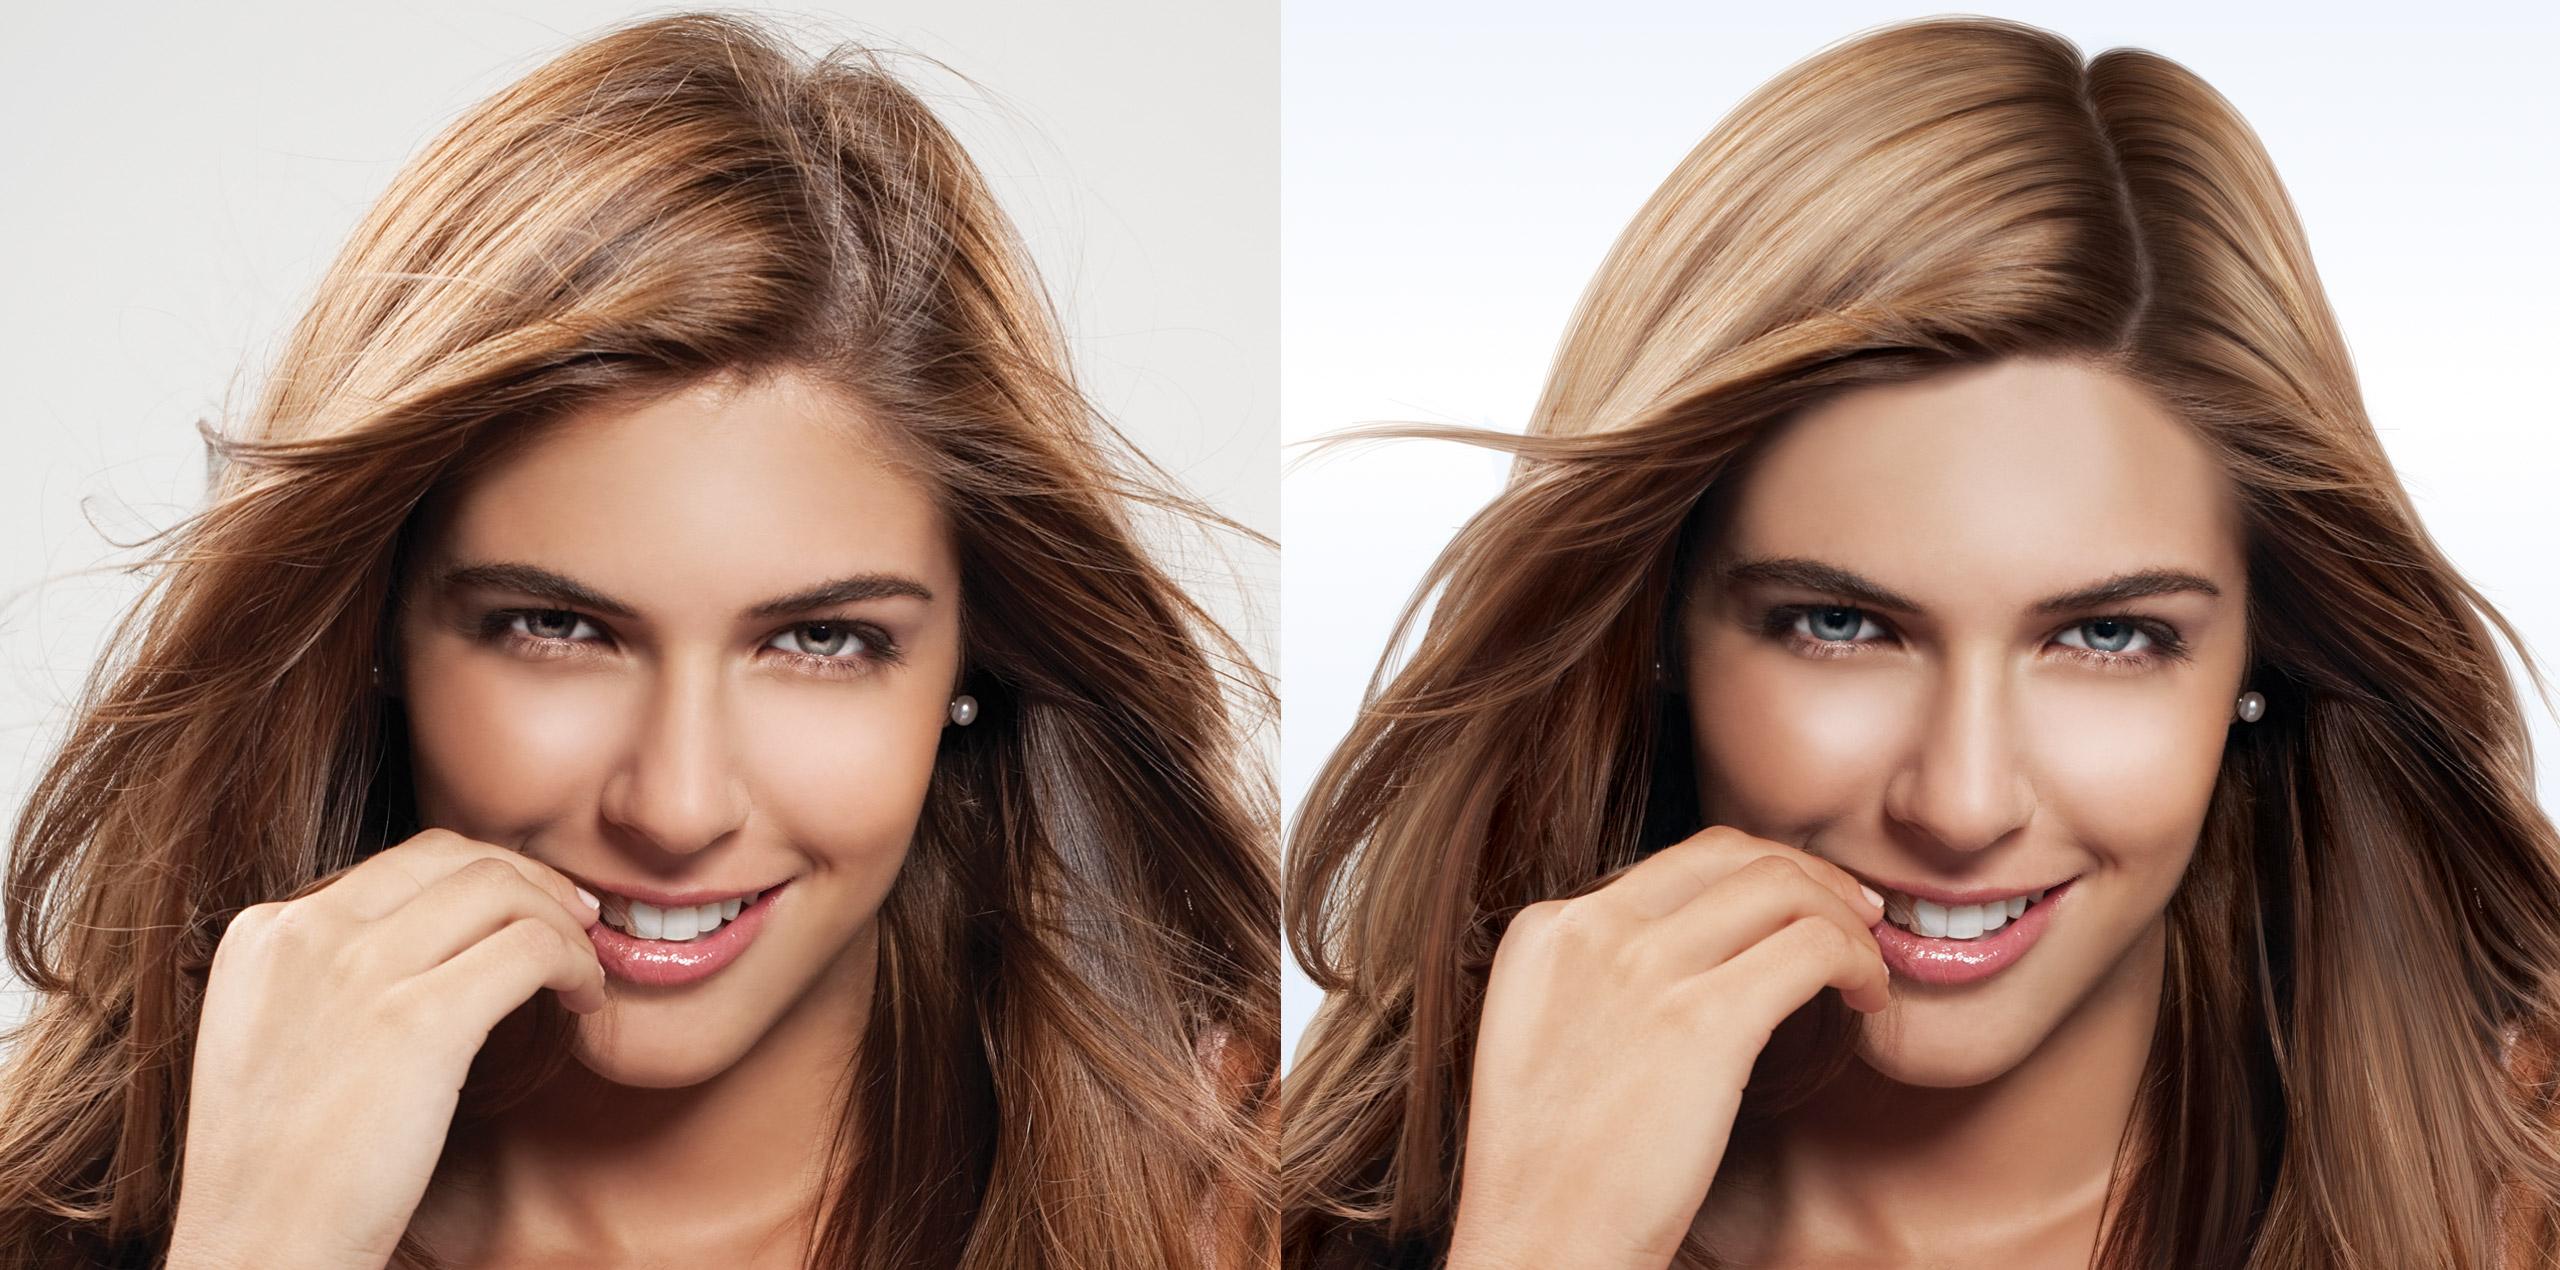 Beauty retouching hair